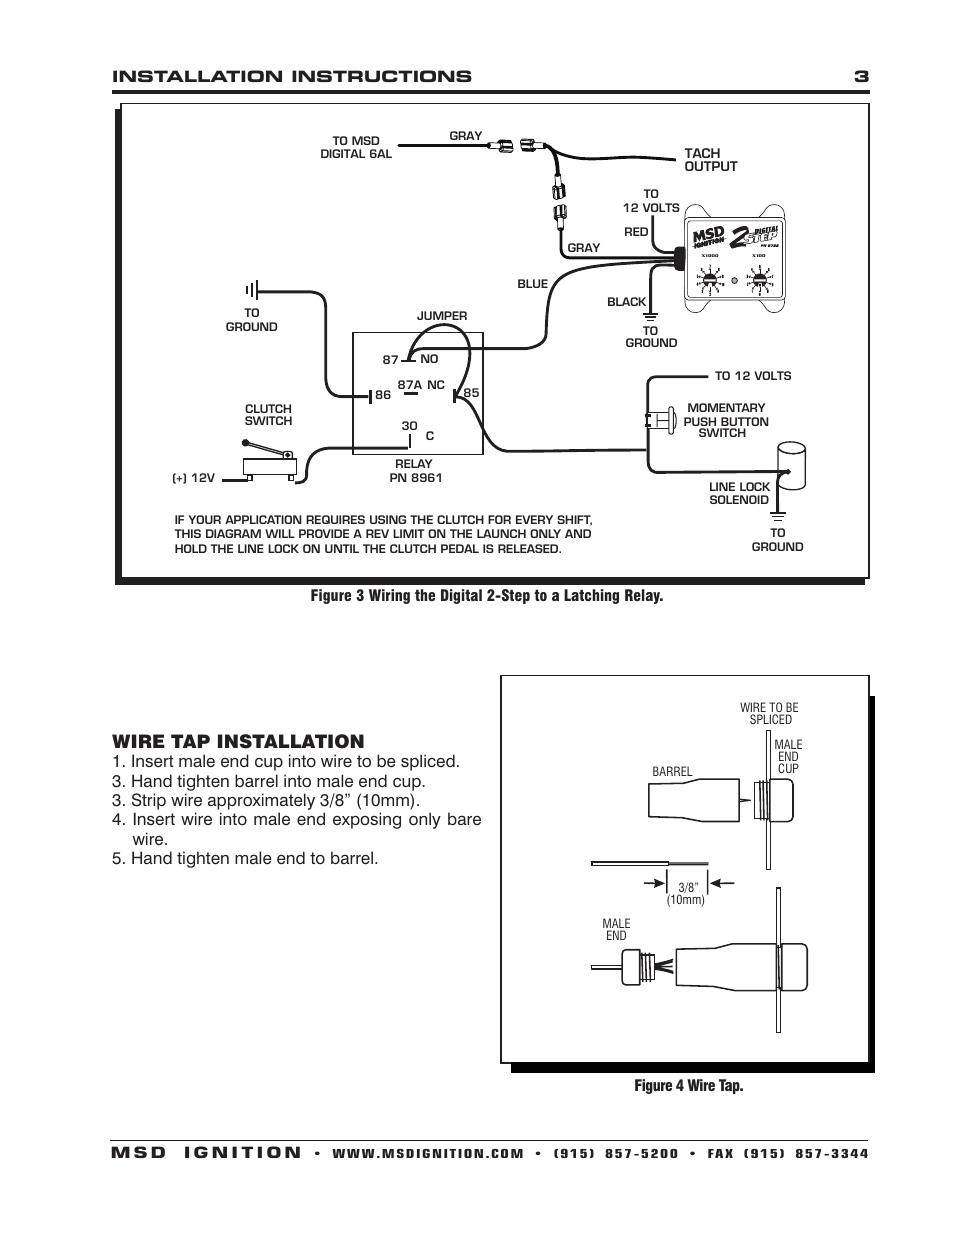 msd 8732 2 step rev control for digital 6al installation page3?resize\\\\\\\\\\\\\\\\\\\\\\\=665%2C861 jvc kd g340 wiring diagram the best wiring diagram 2017 jvc kd g340 wiring diagram at gsmx.co